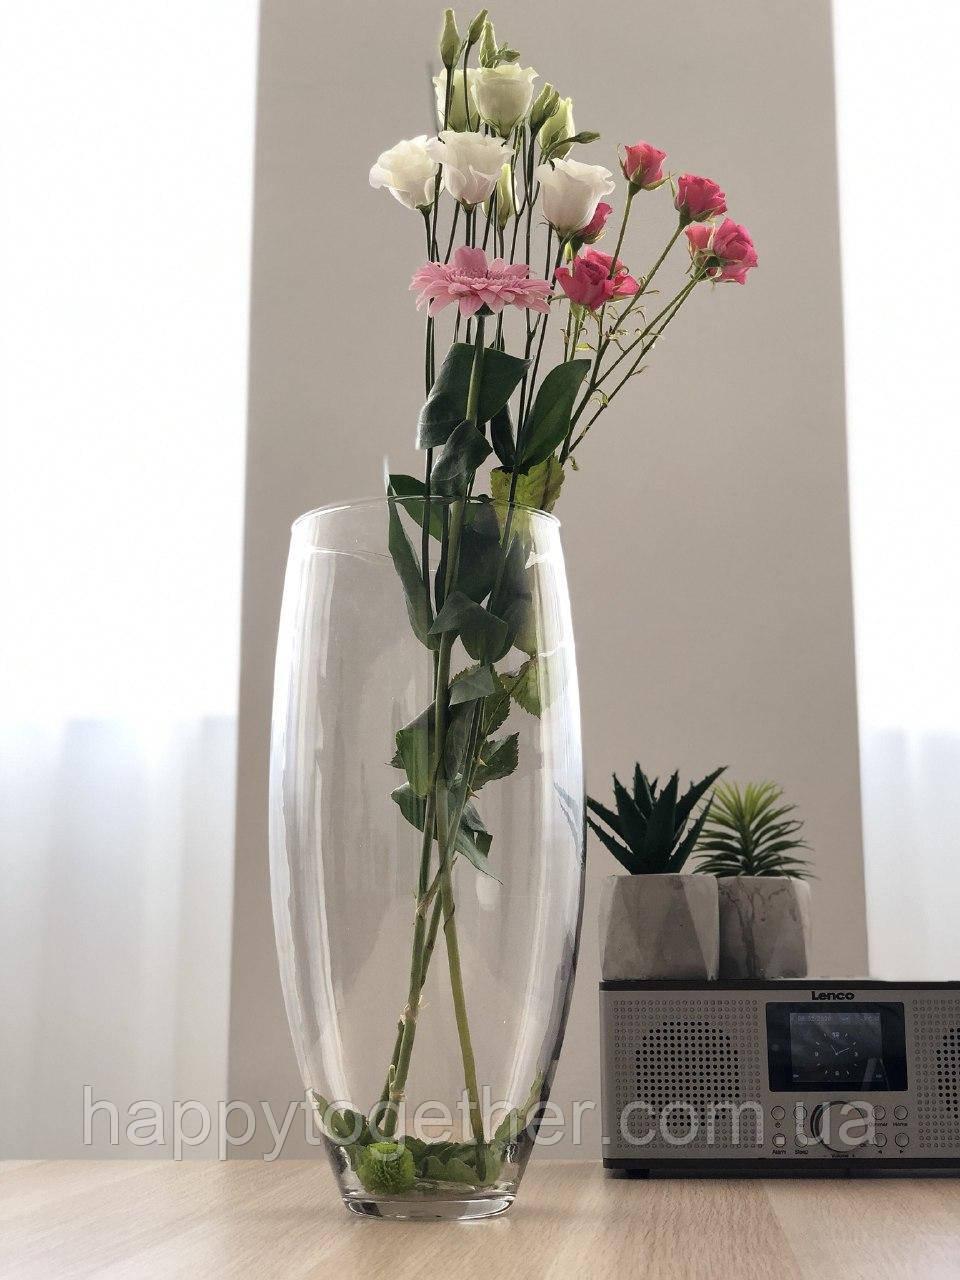 Ваза фигурная  для флористики.  h  27 см,  13,5 см .